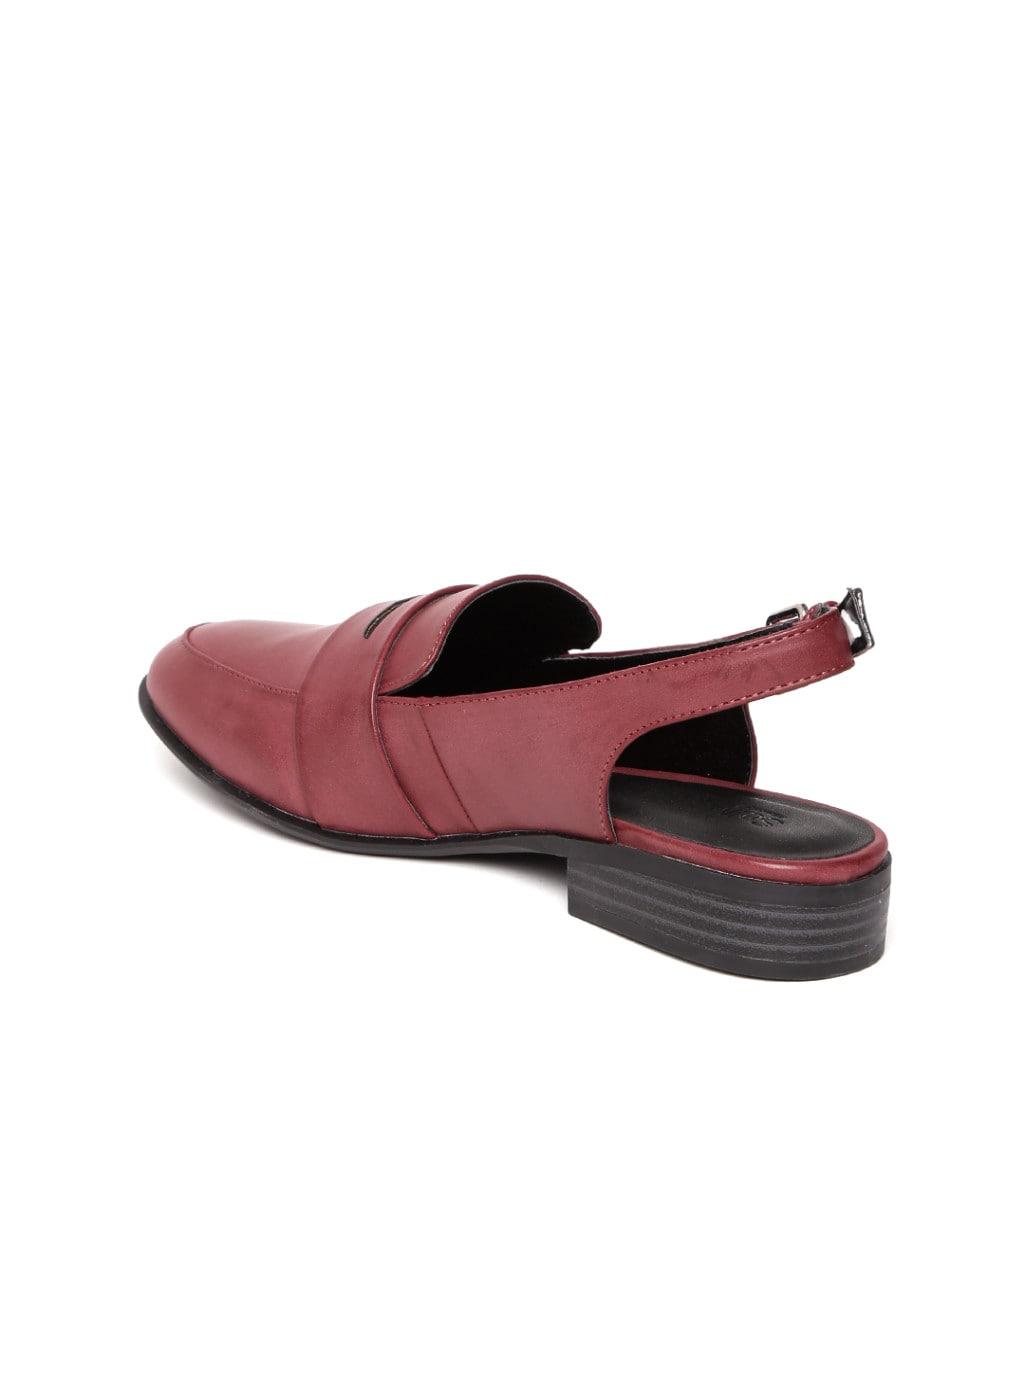 Buy ADIDAS Argo W Purple Floaters Online 4761559 Jabong